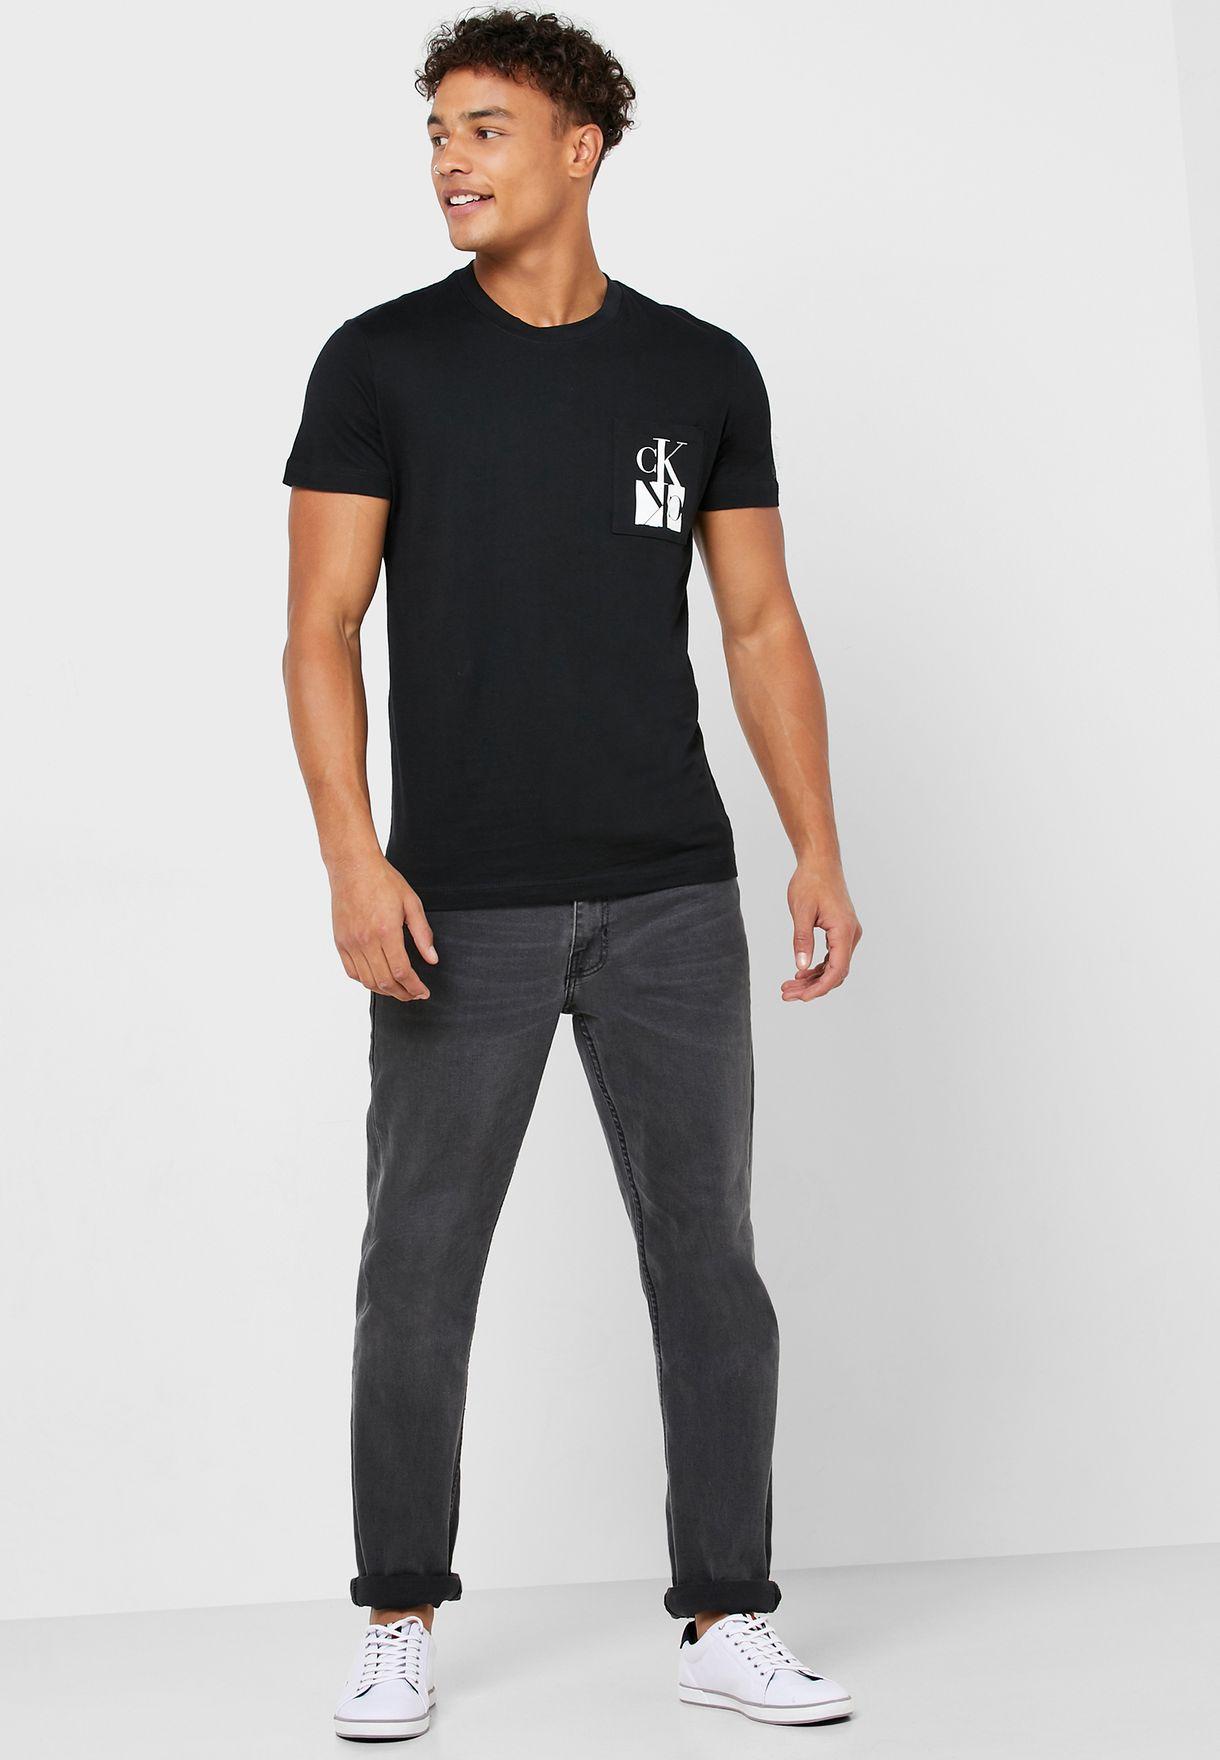 Mirrored Logo Pocket Crew Neck T-Shirt